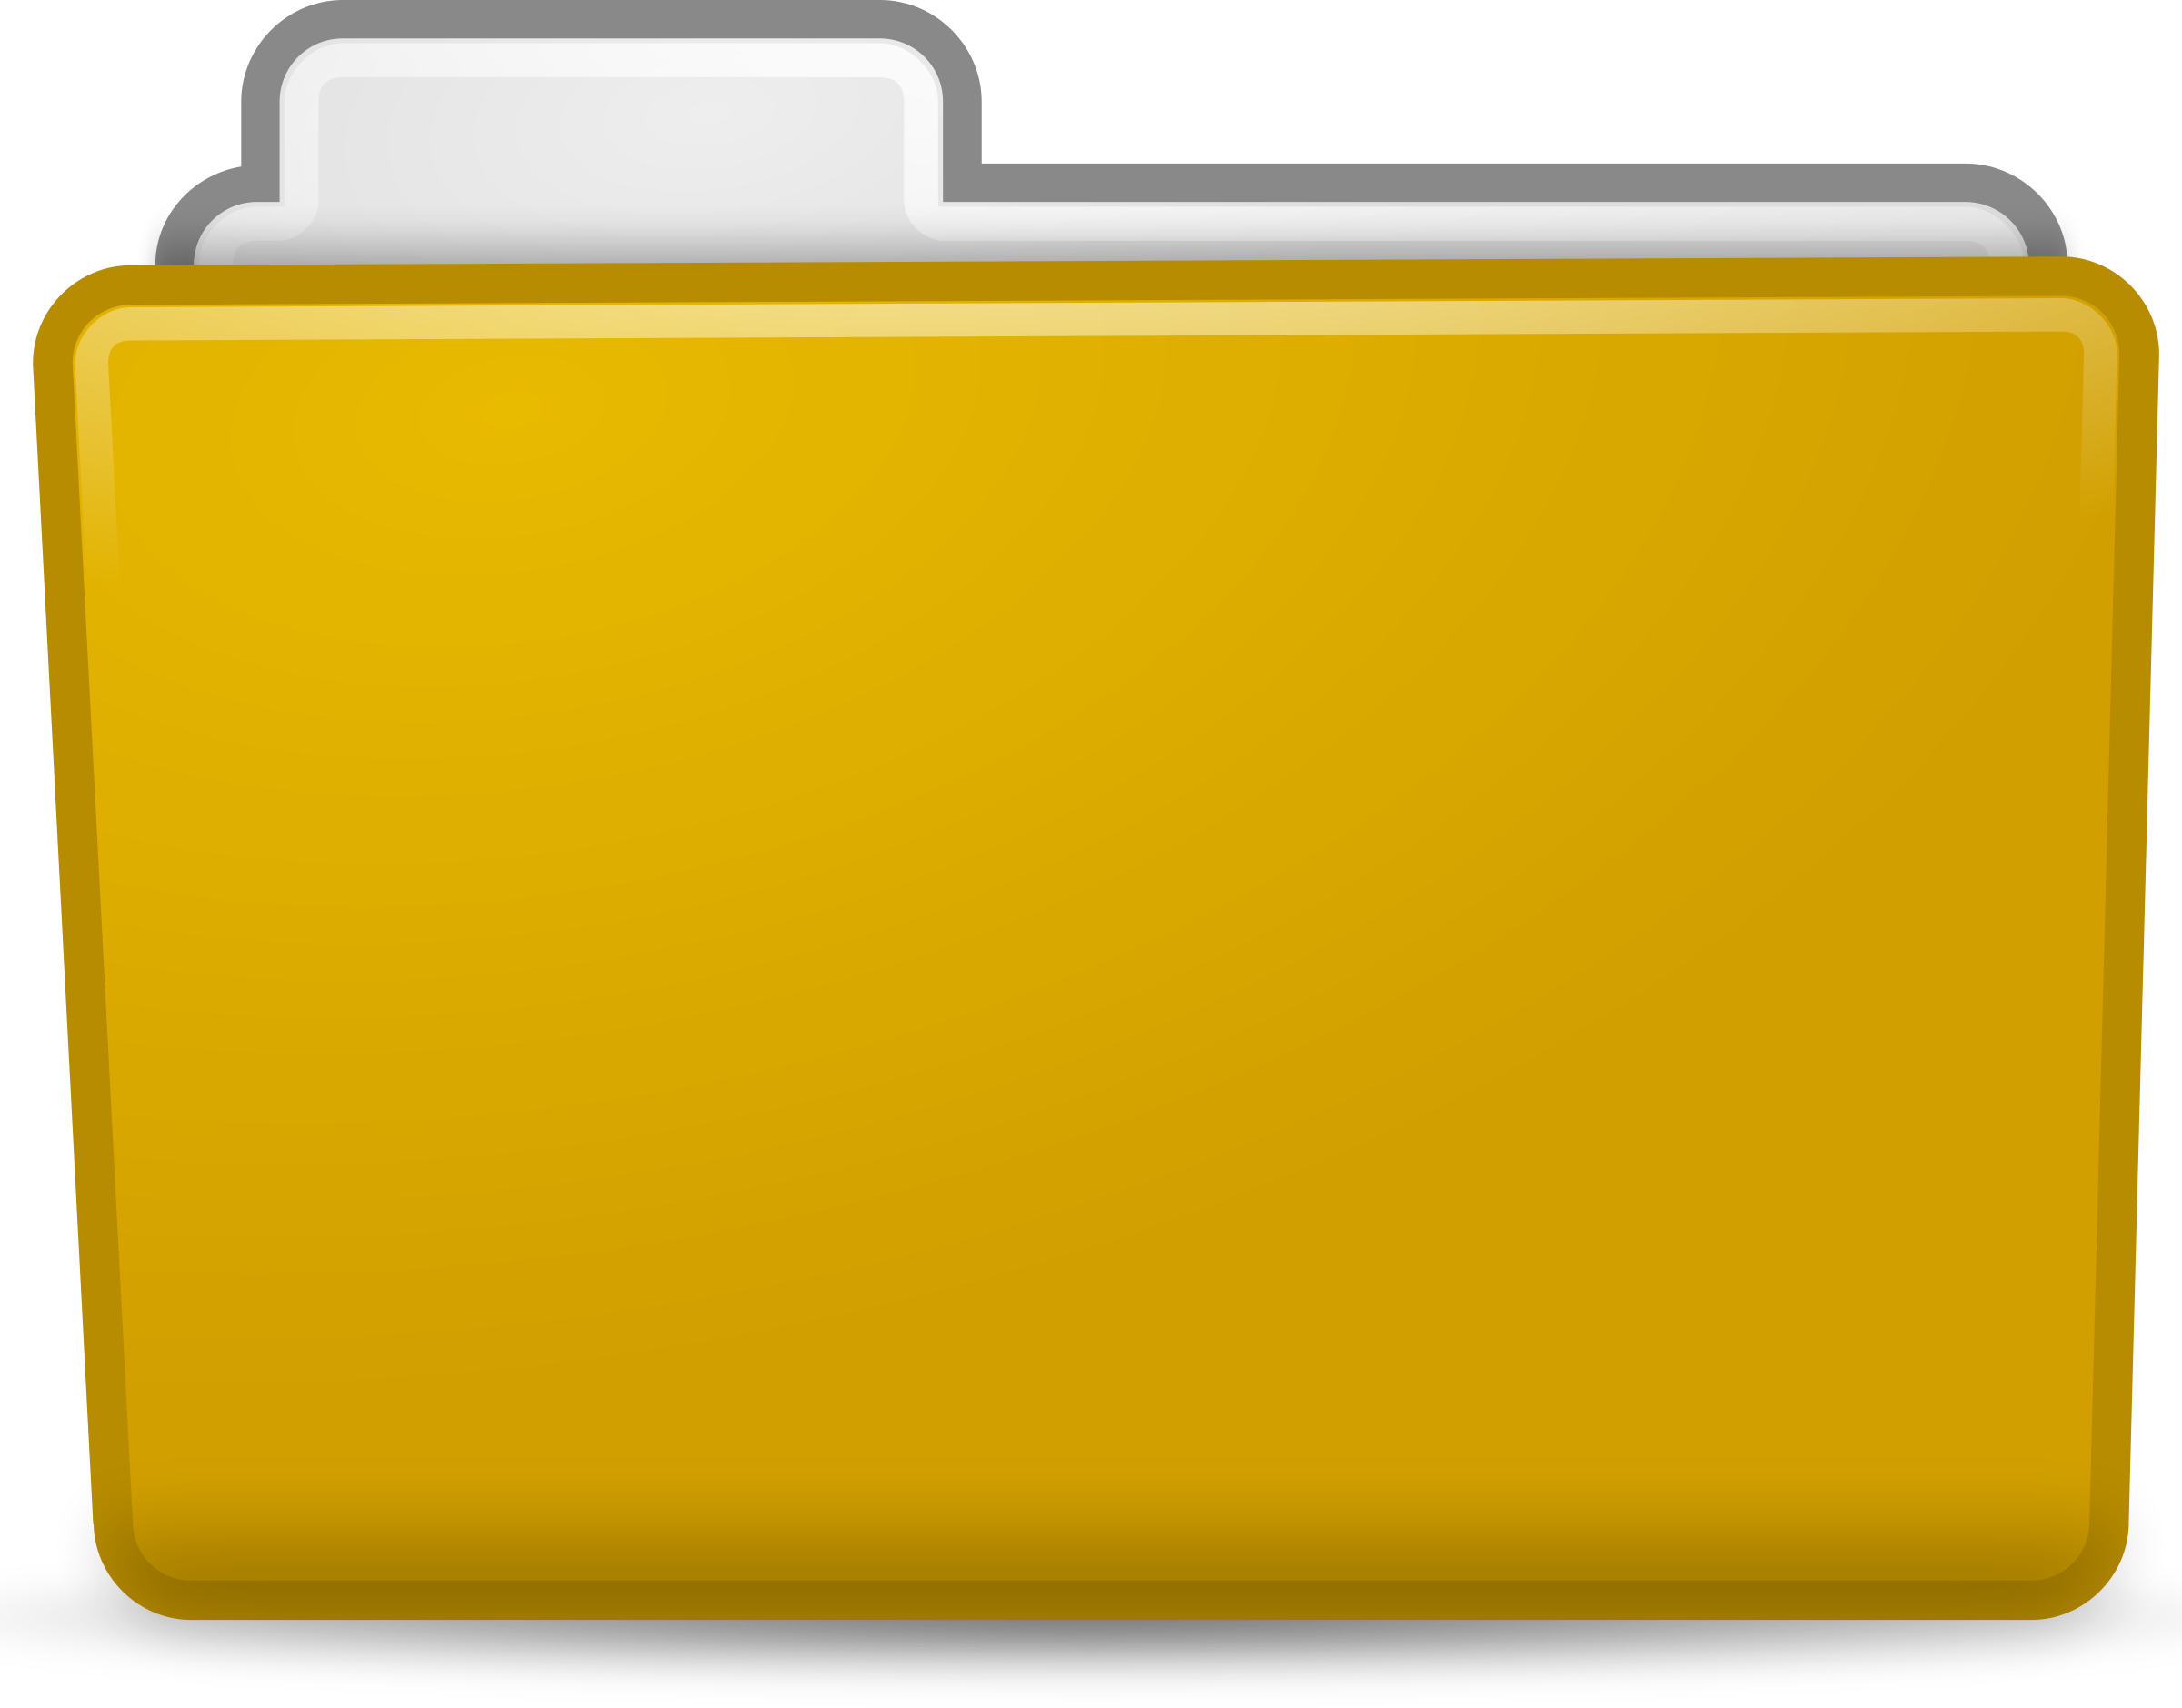 School folder clipart vector freeuse School Window Clipart. Fabulous Orange Clipart School Bus With ... vector freeuse